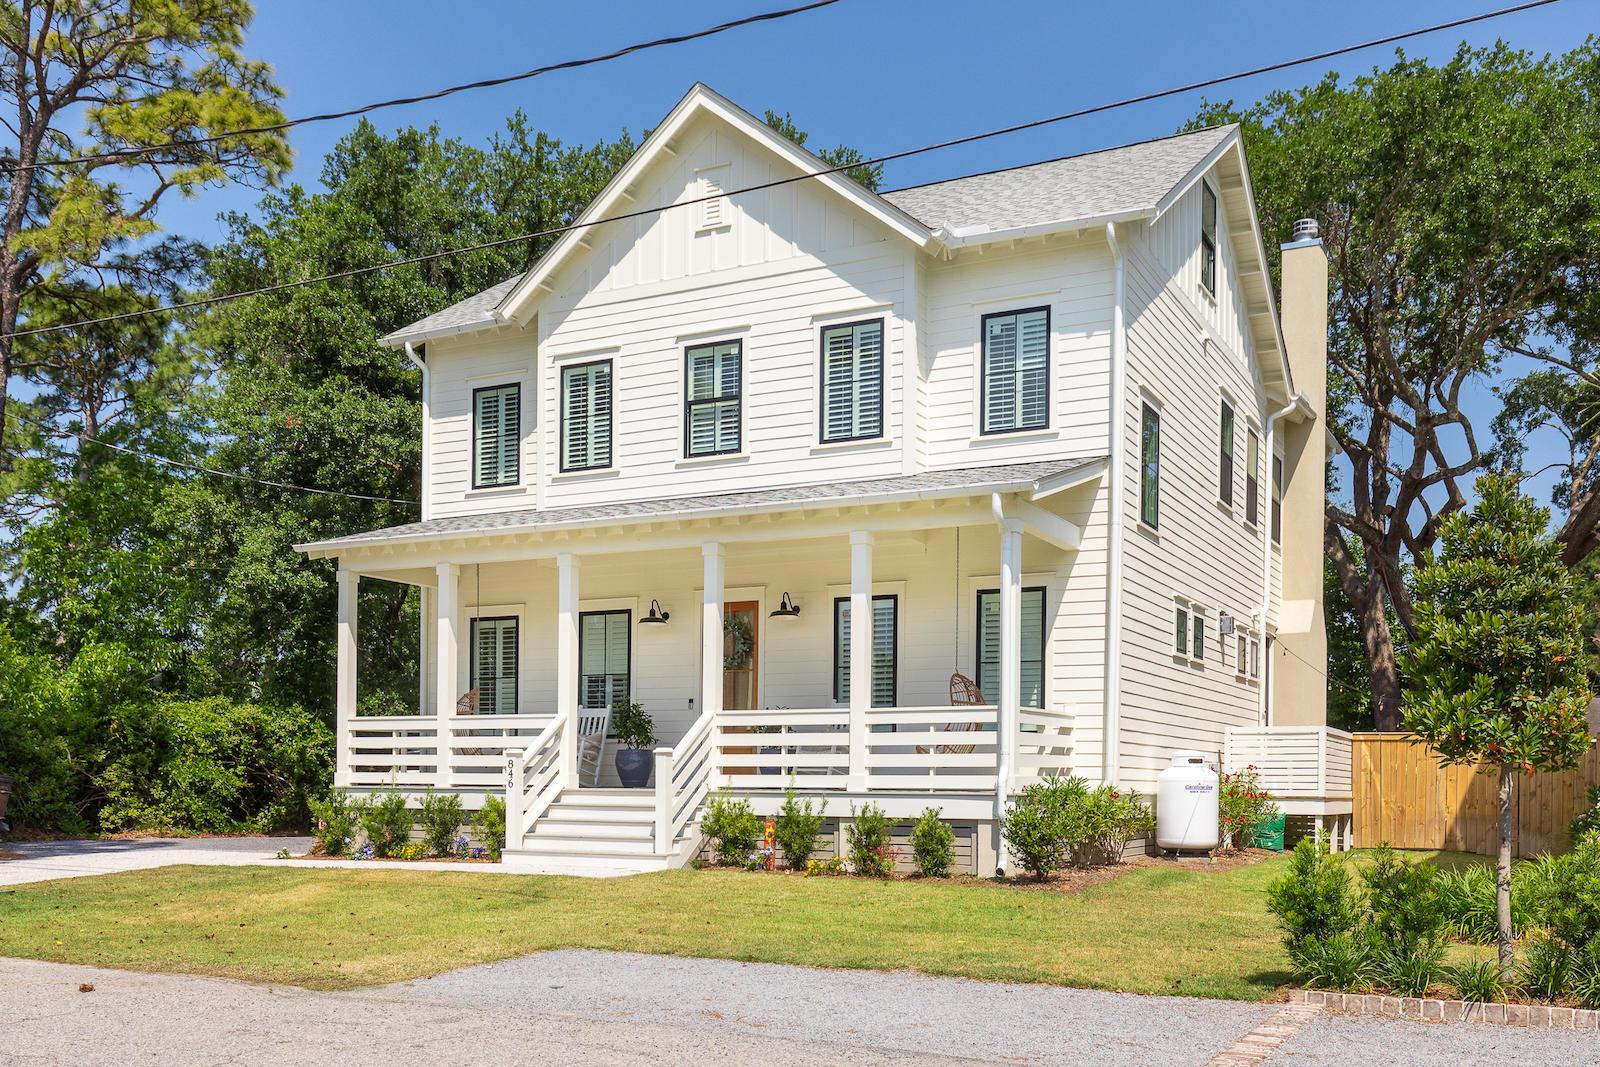 Old Mt Pleasant Homes For Sale - 546 Center, Mount Pleasant, SC - 38